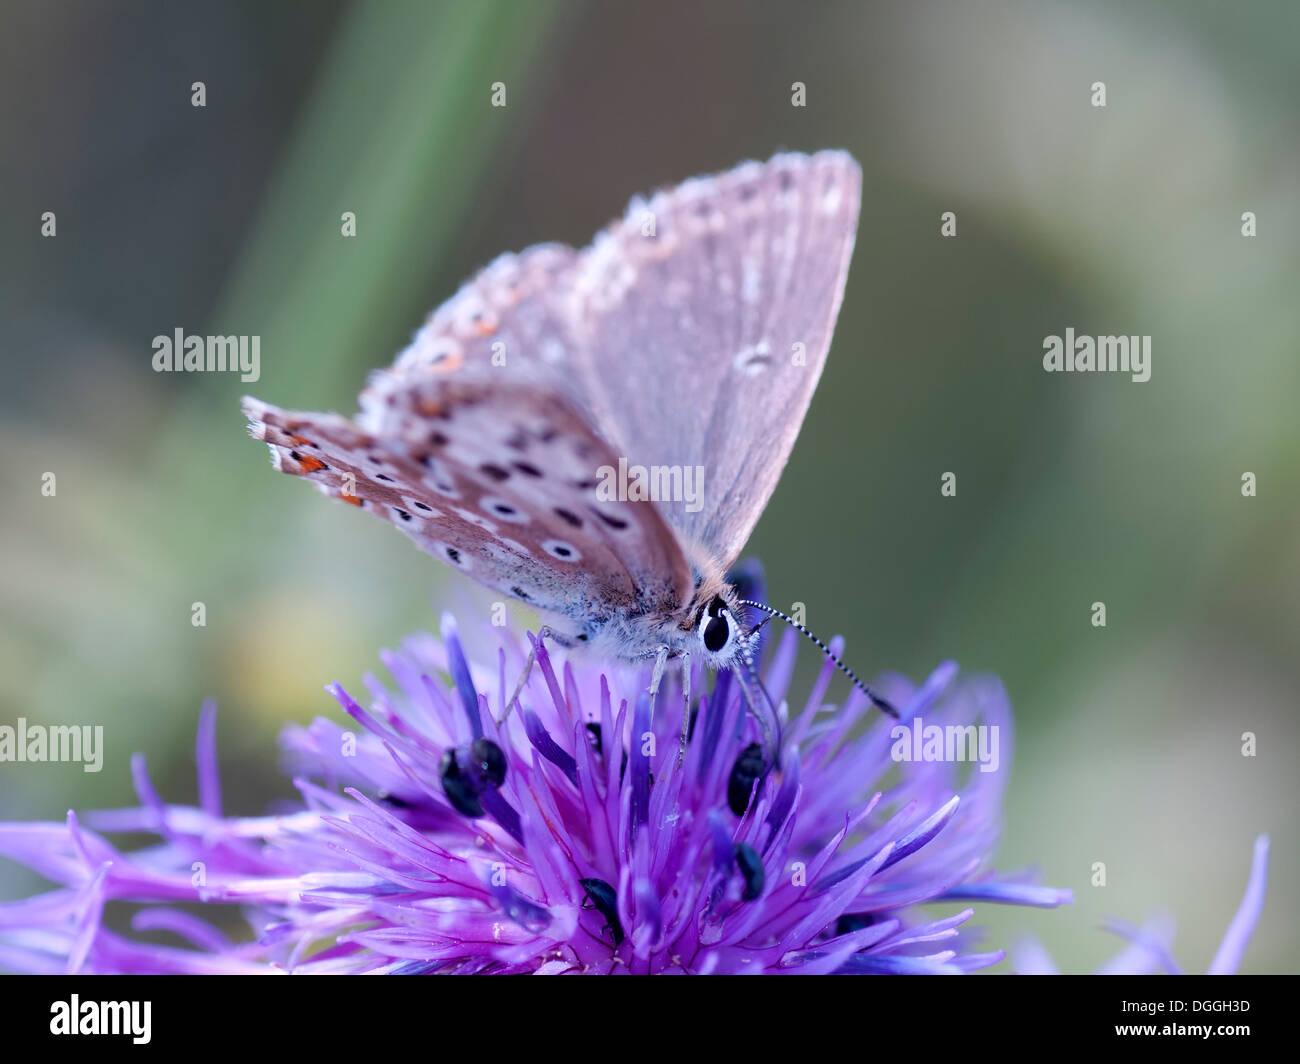 A Chalkhill Blue butterfly ( Lysandra coridon ) nectars on a thistle head - Stock Image